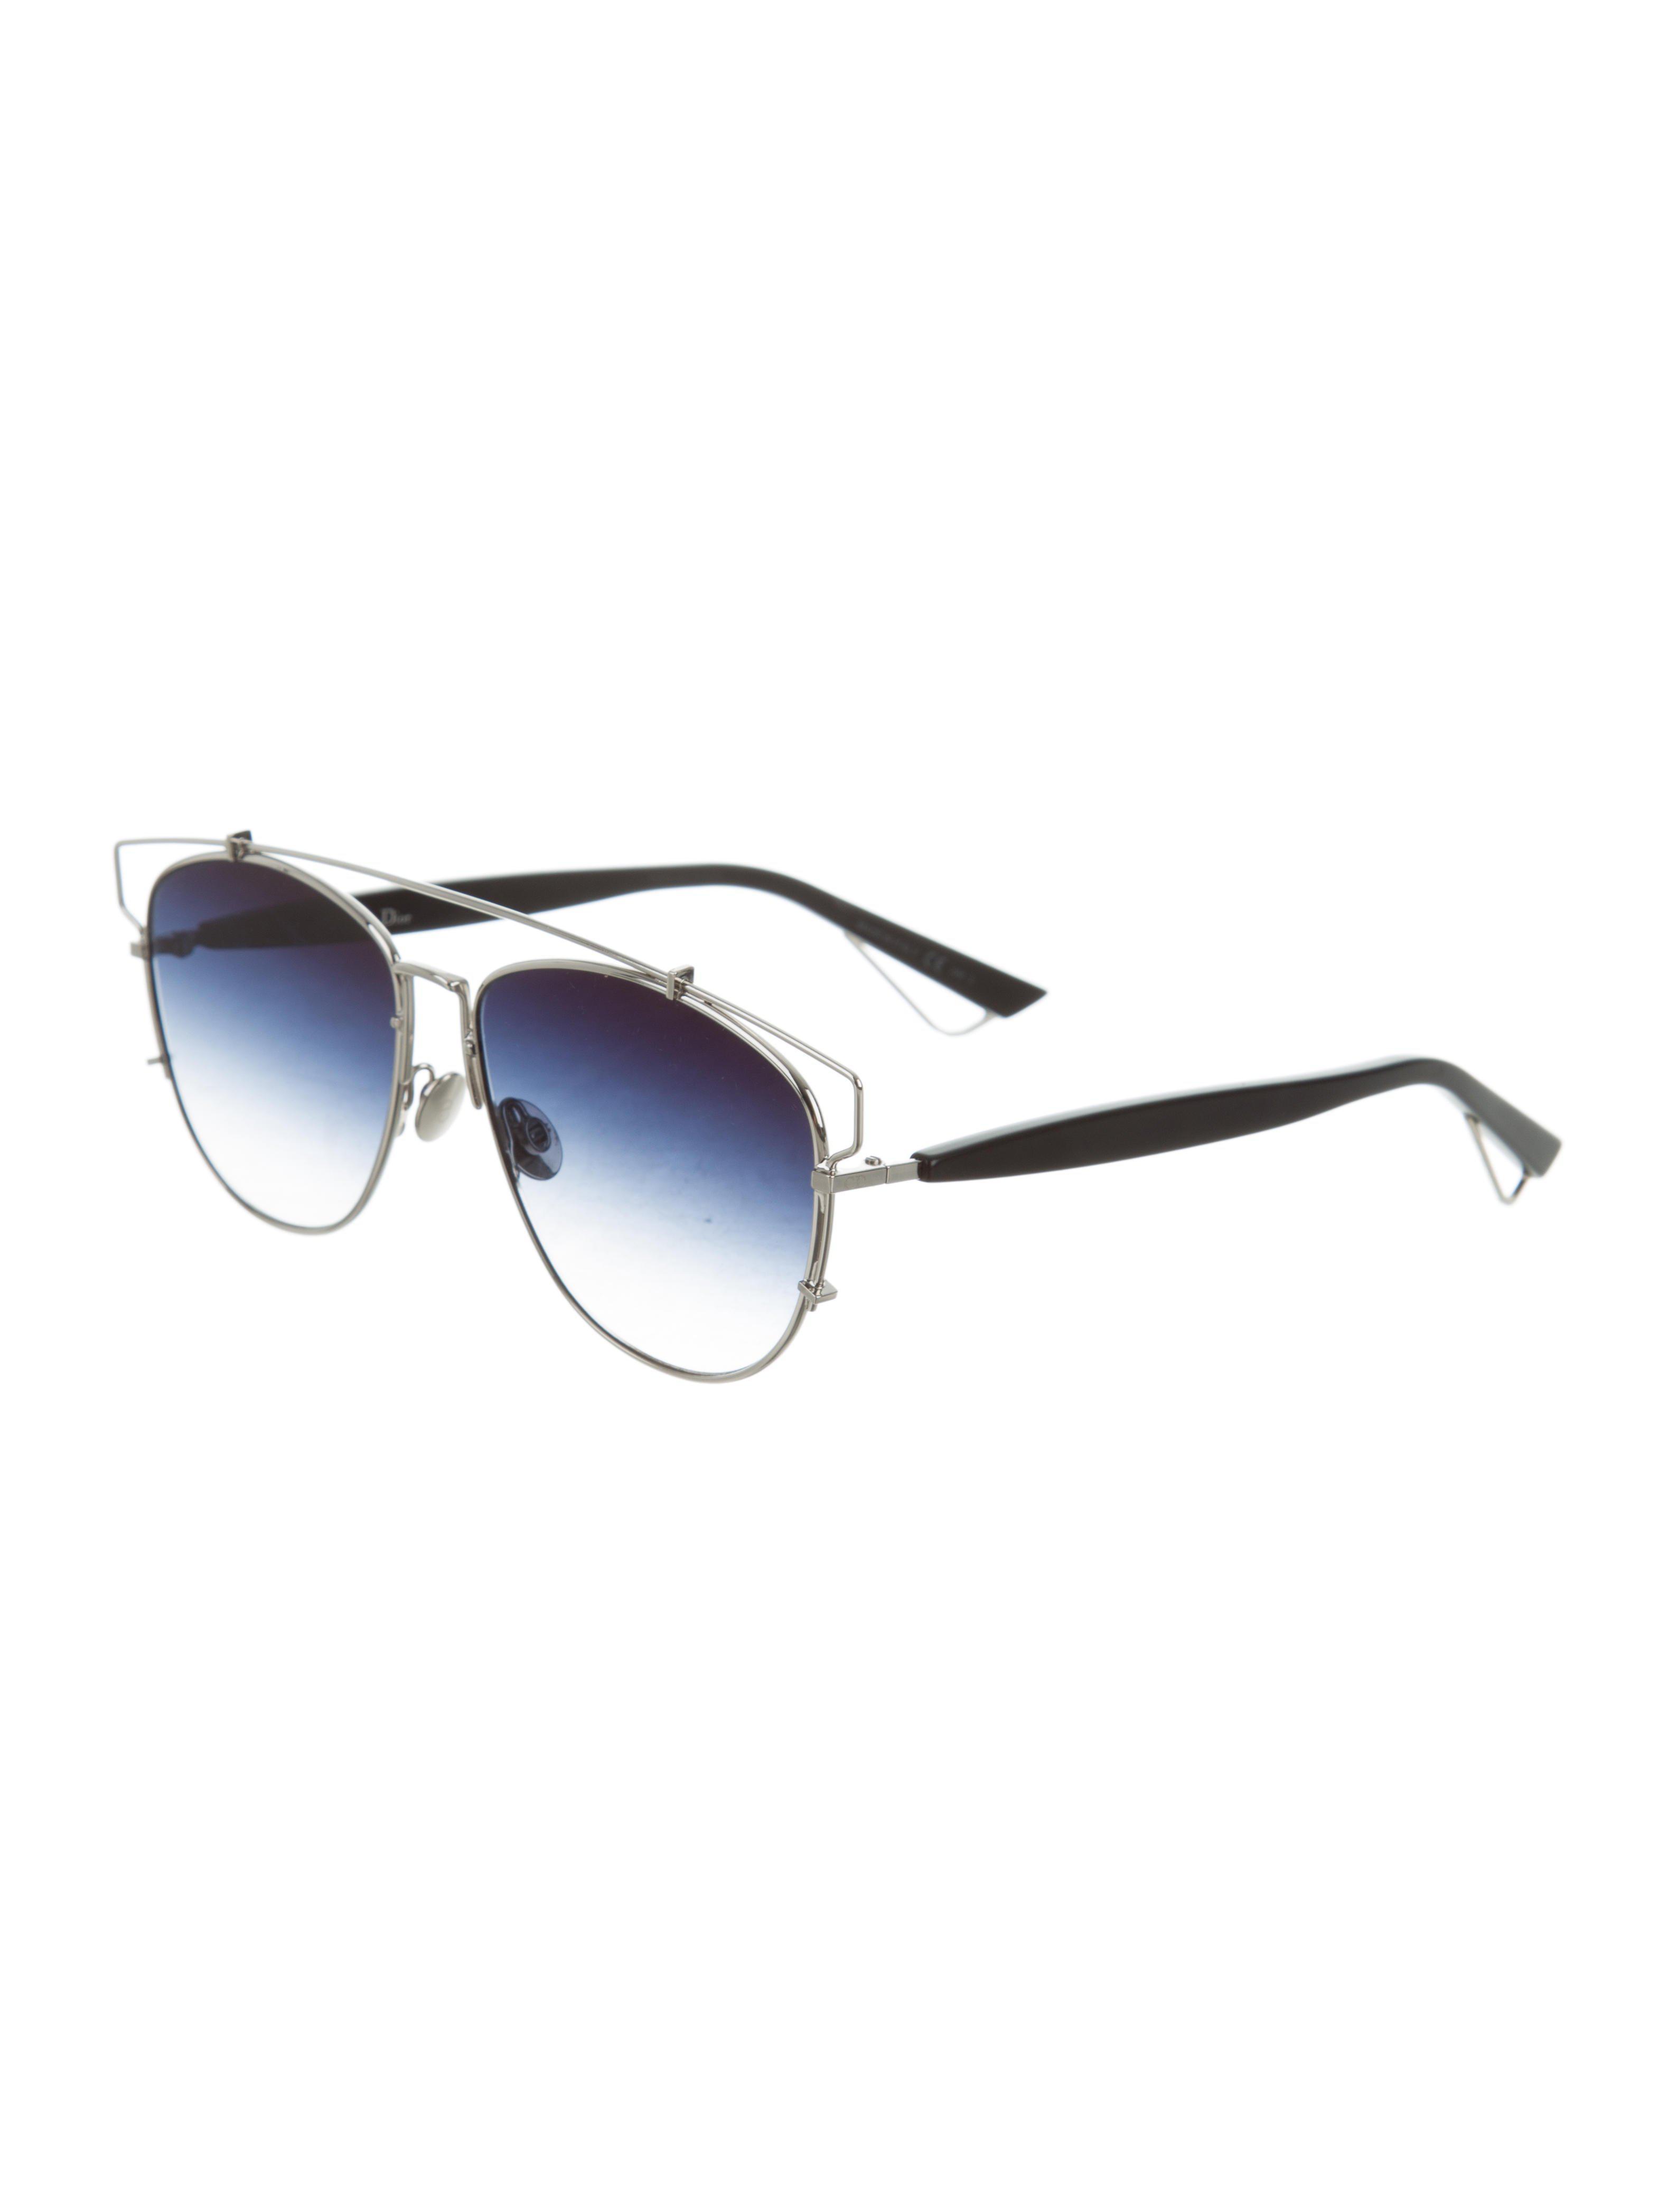 2d6770464d2 Lyst - Dior Technologic Gradient Sunglasses Silver in Metallic